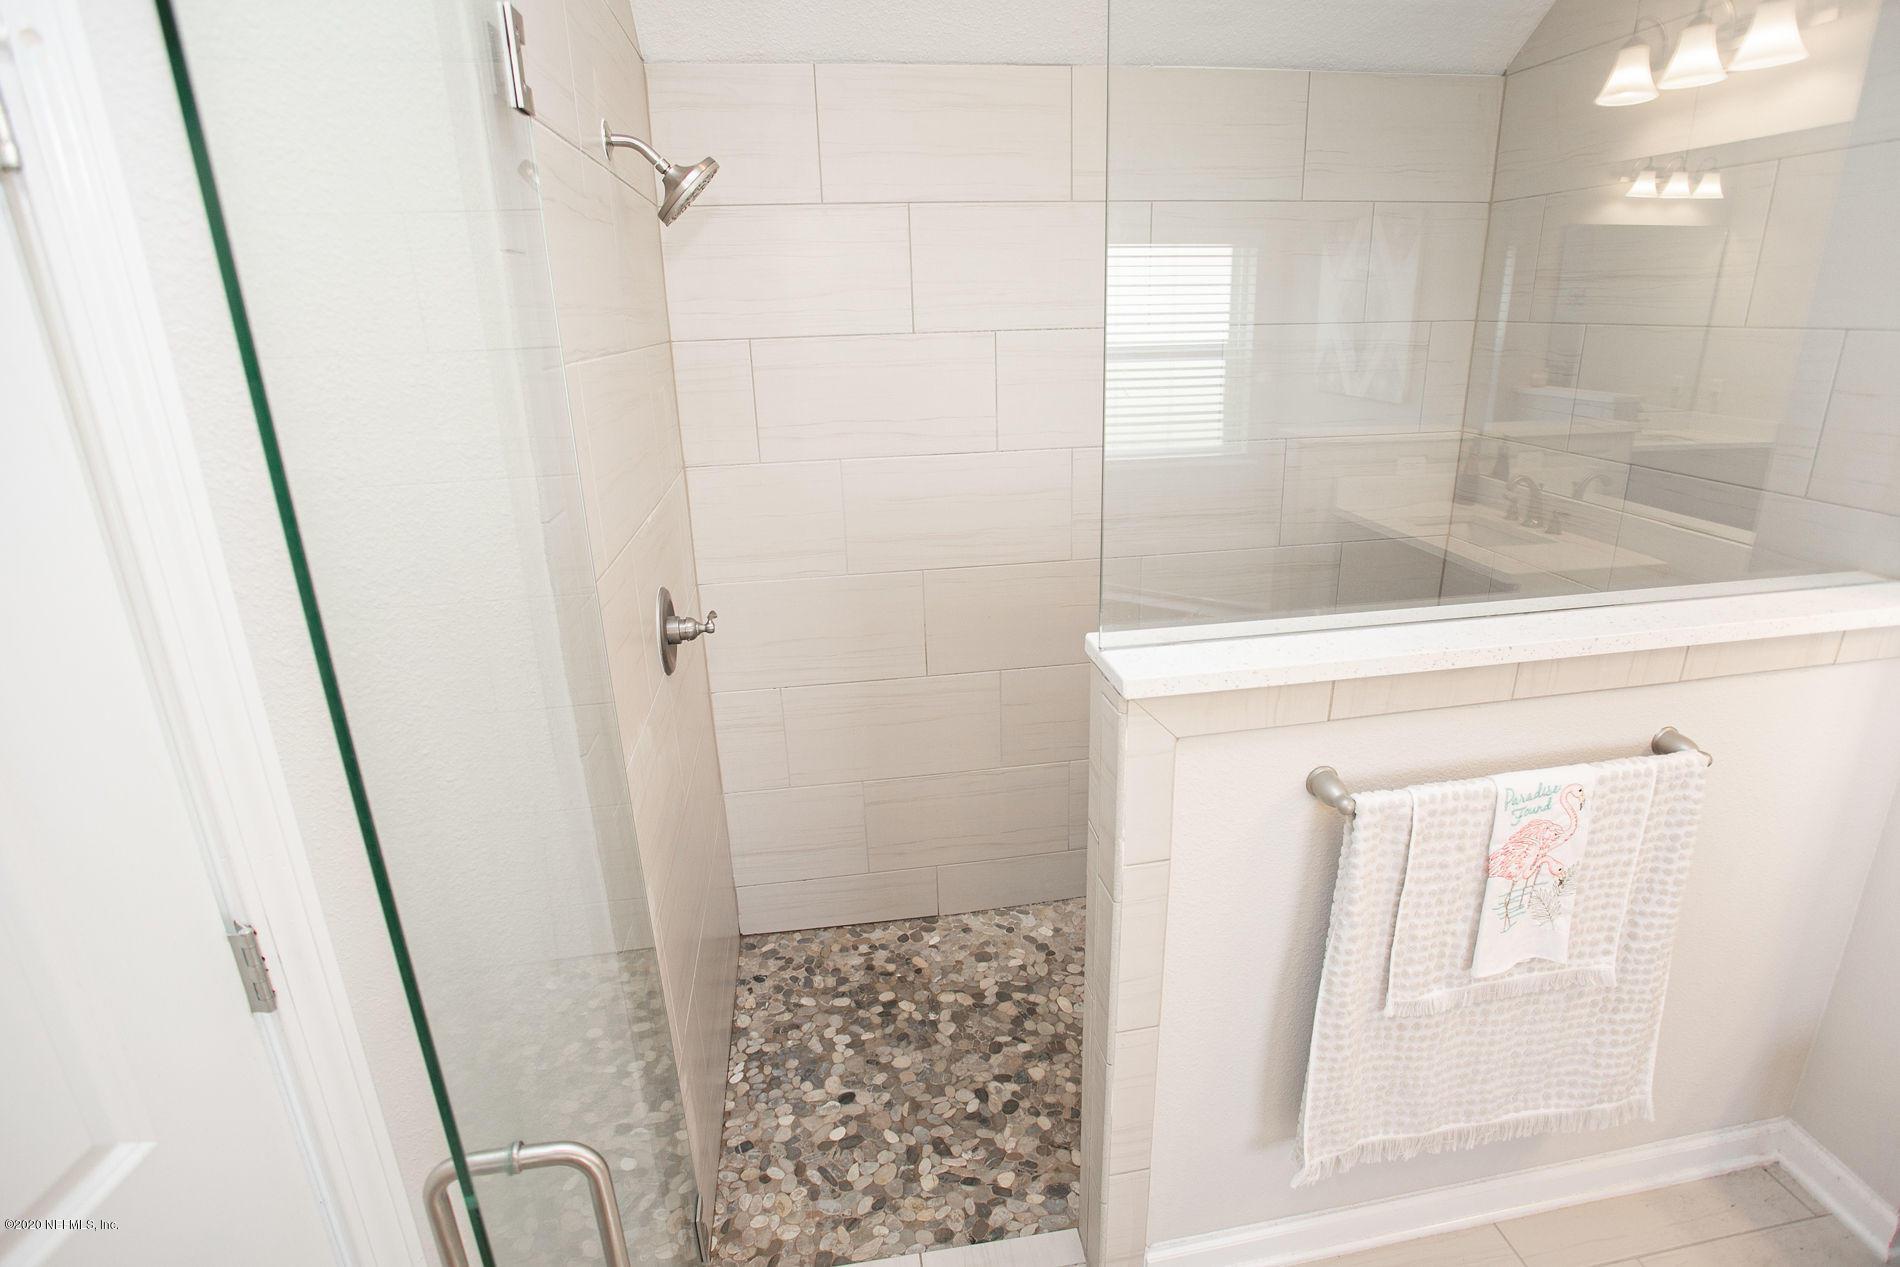 382 PORTADA, ST AUGUSTINE, FLORIDA 32095, 4 Bedrooms Bedrooms, ,3 BathroomsBathrooms,Residential,For sale,PORTADA,1081737